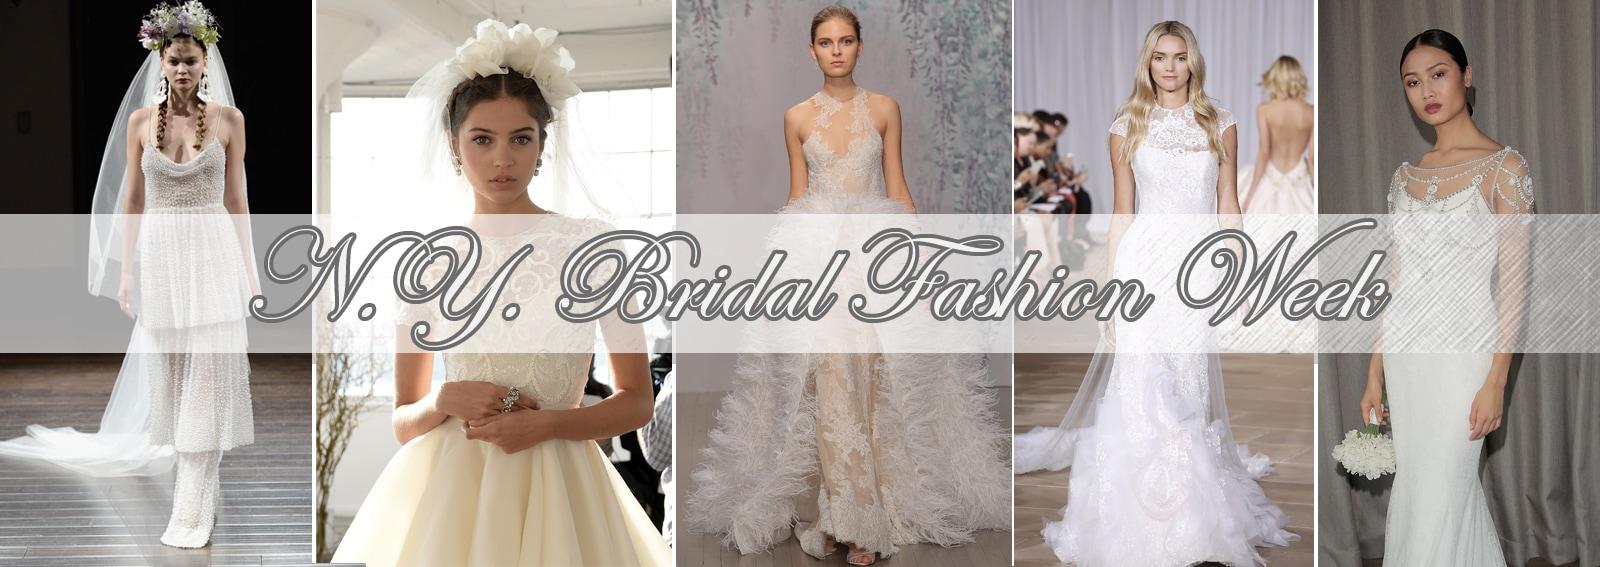 cover-ny-bridal-fashion-week-DESKTOP